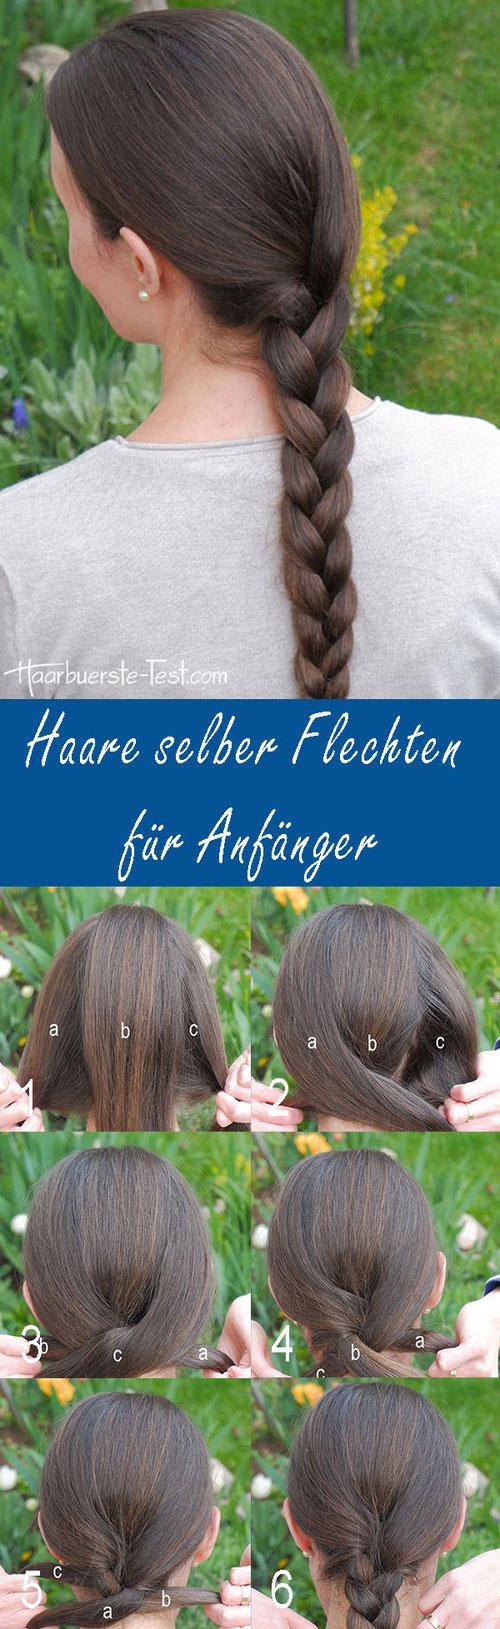 Haare selber flechten für Anfänger: einen Zopf selber flechten